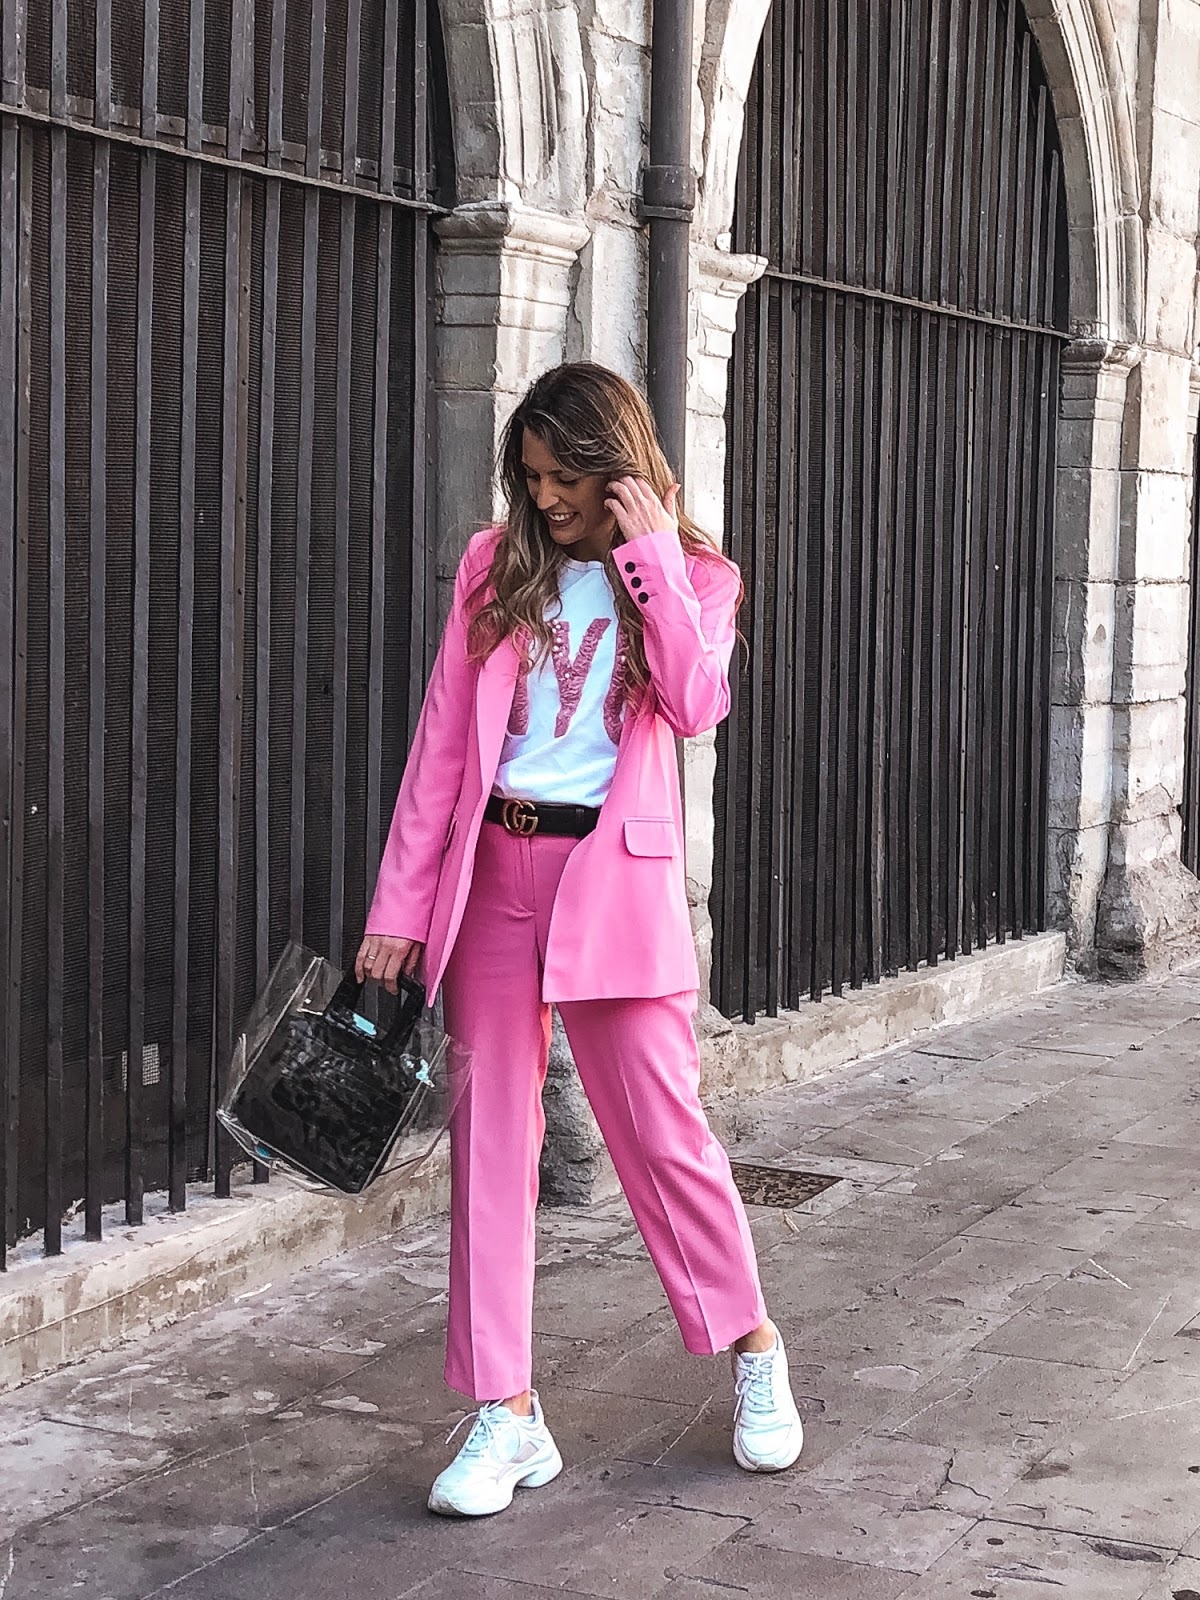 trajes en tonos pastel